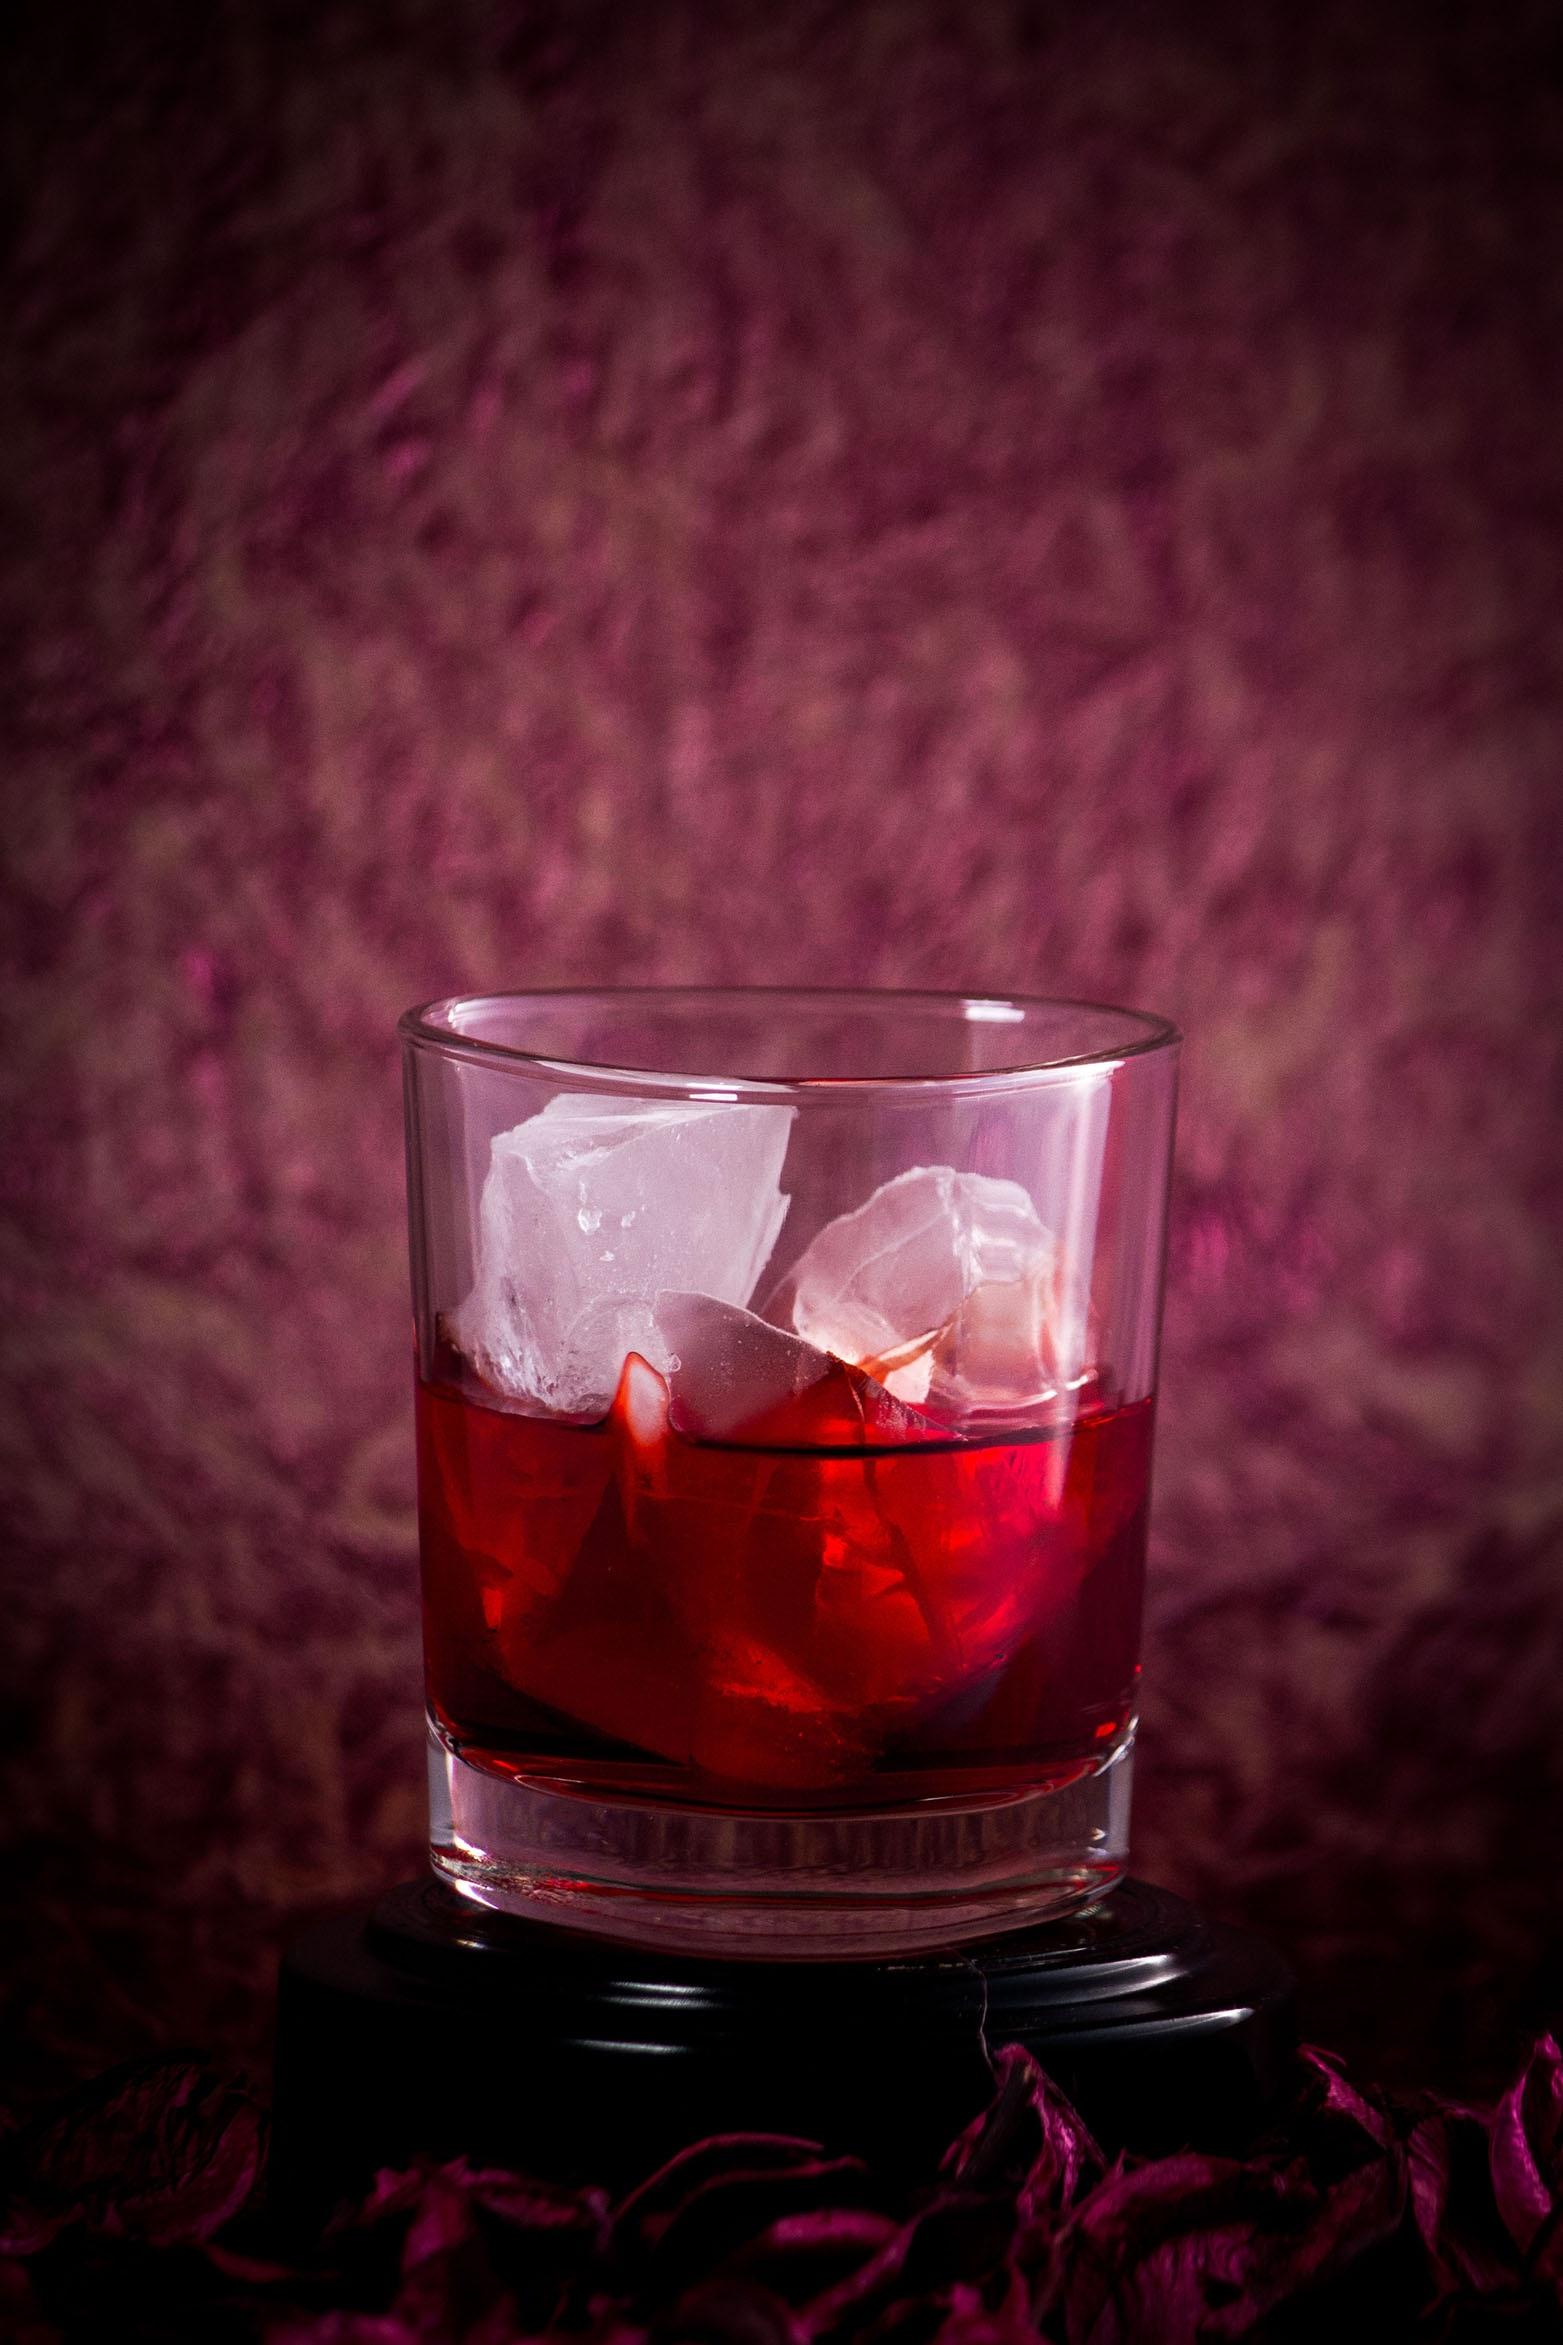 83 Gambar Anggur Merah HD